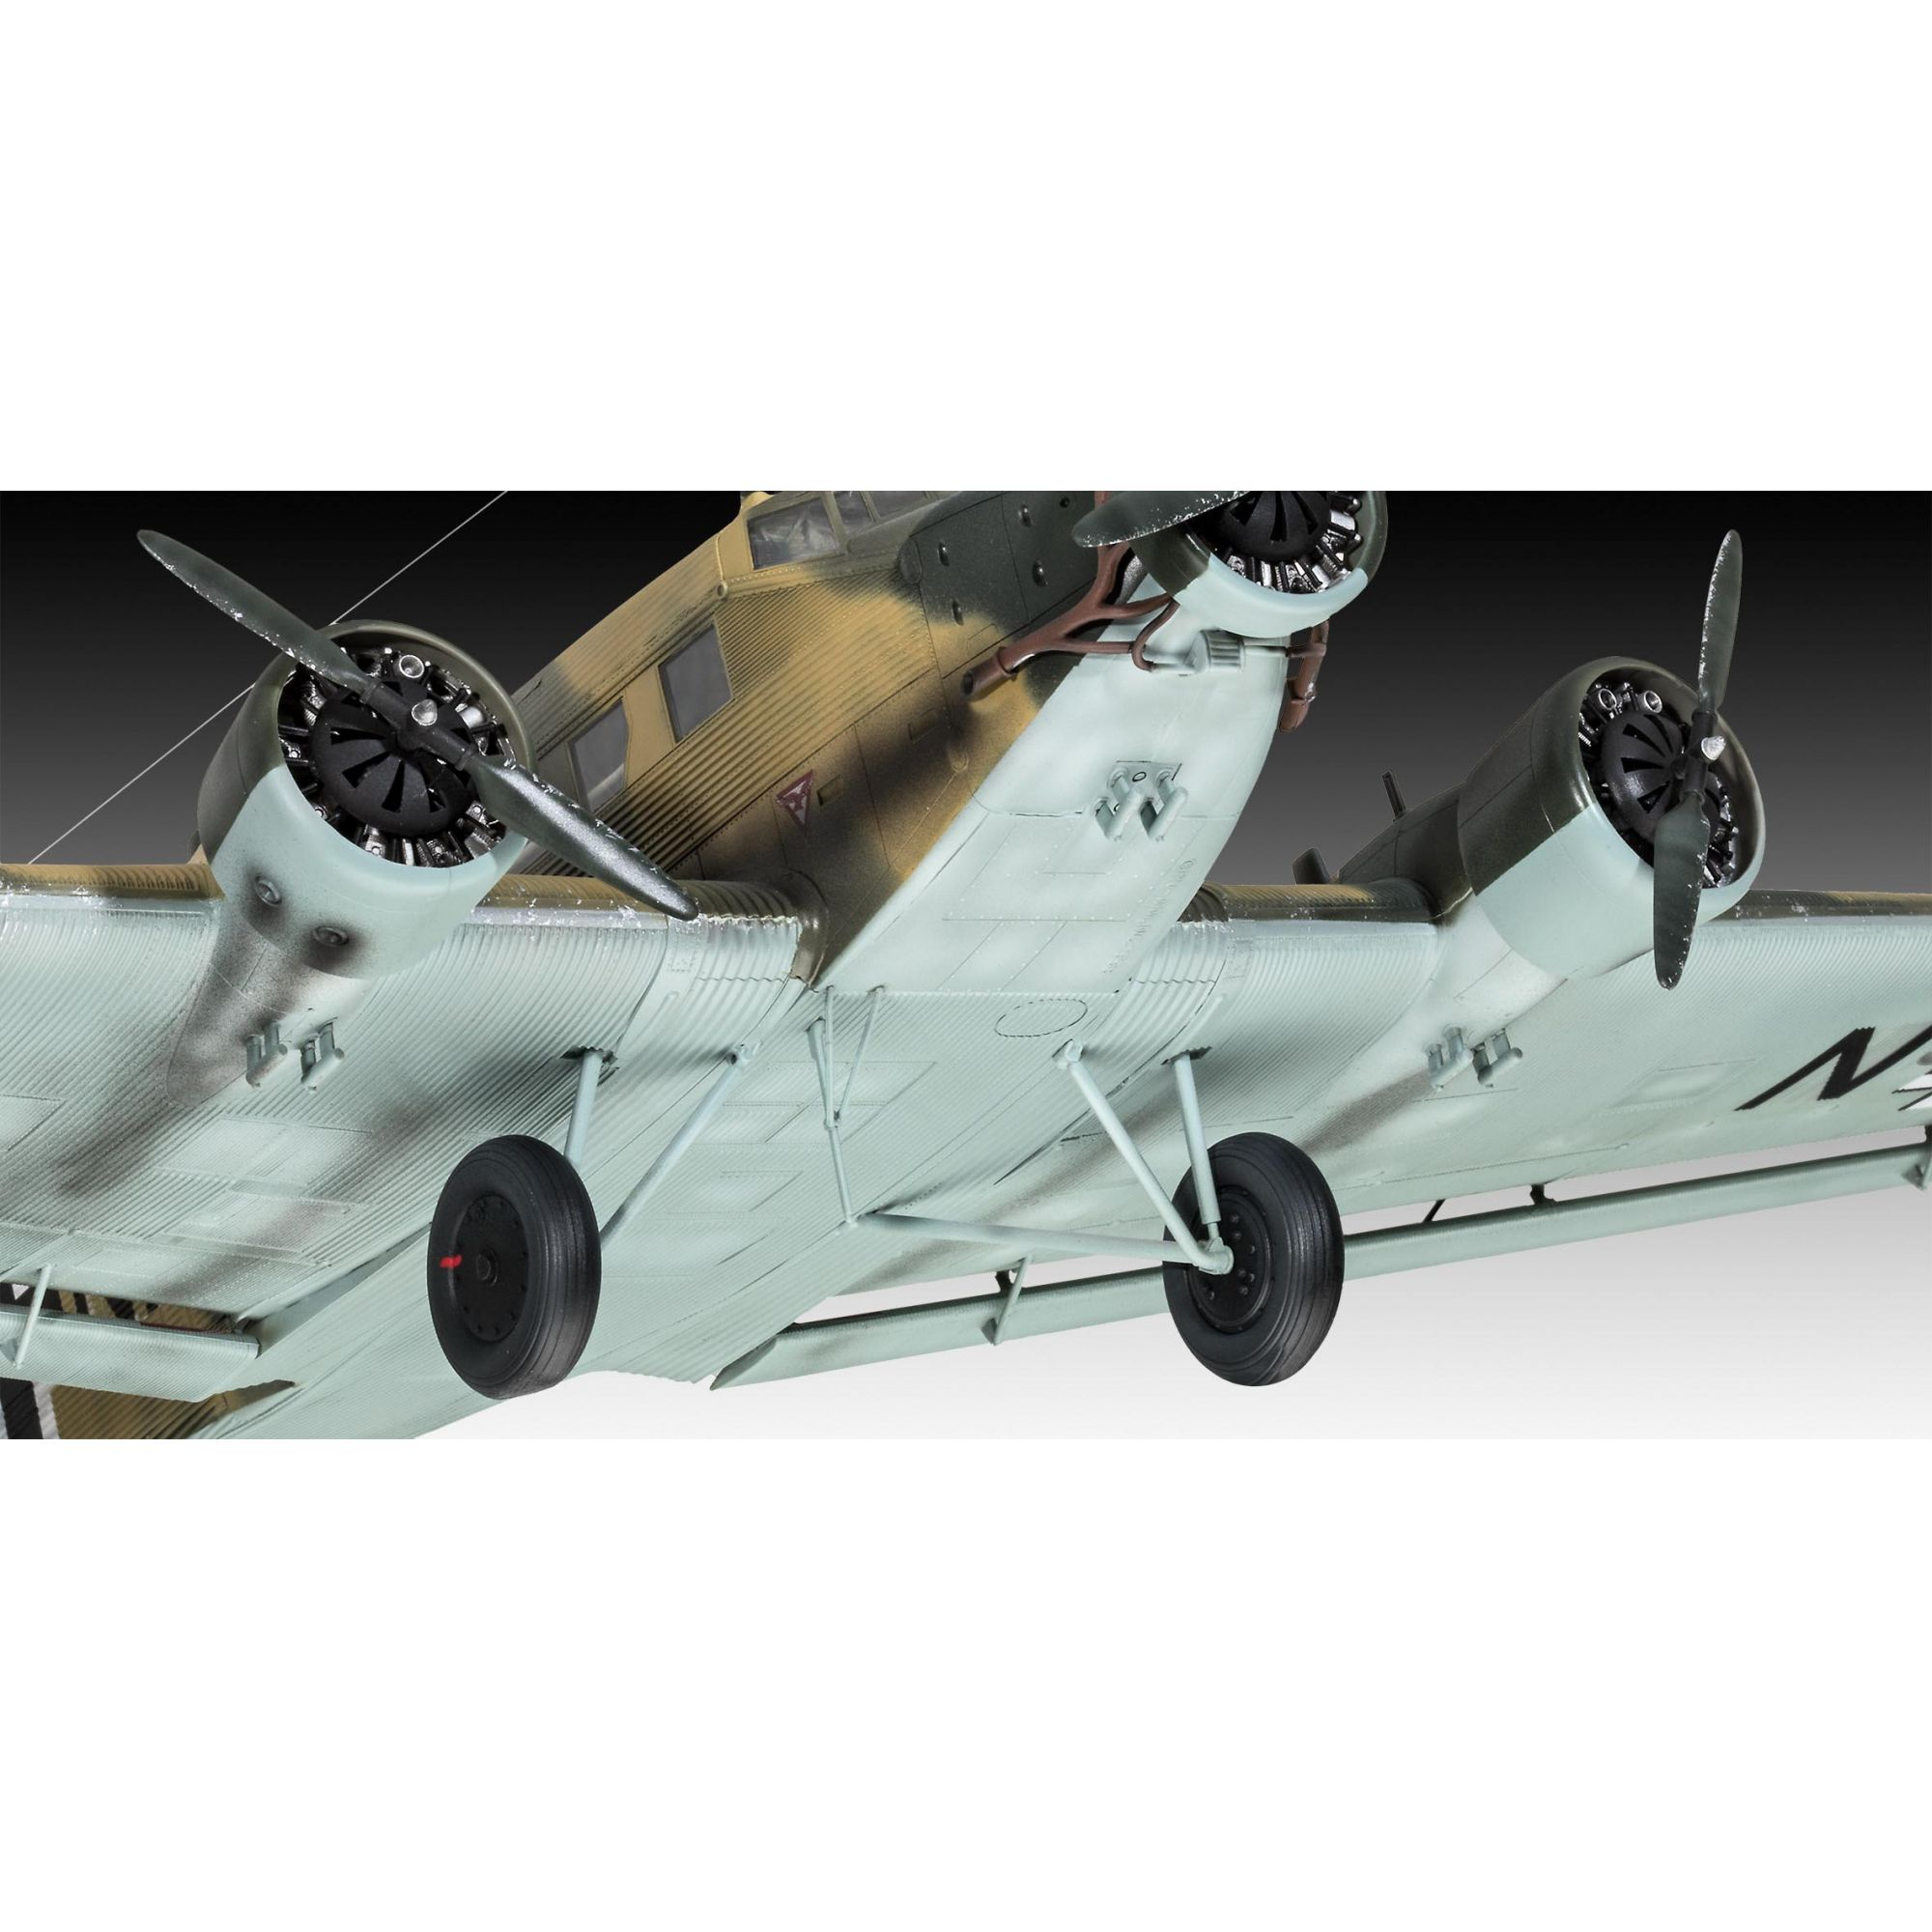 Junkers Ju52/3m Transport - 1/48 - Revell 03918  - BLIMPS COMÉRCIO ELETRÔNICO